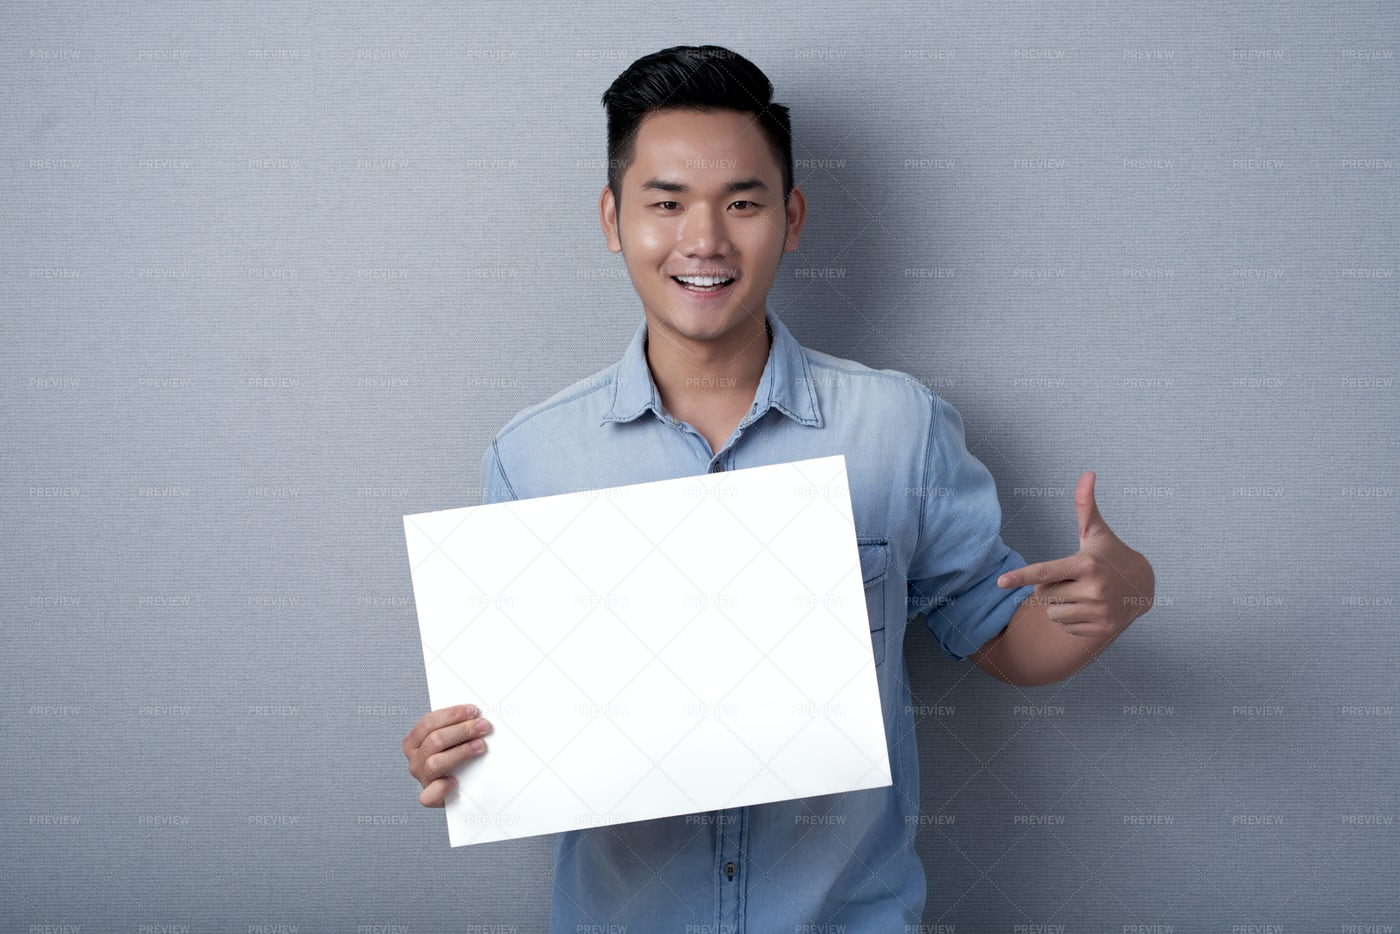 Smiling Asian Man With Sheet Of...: Stock Photos